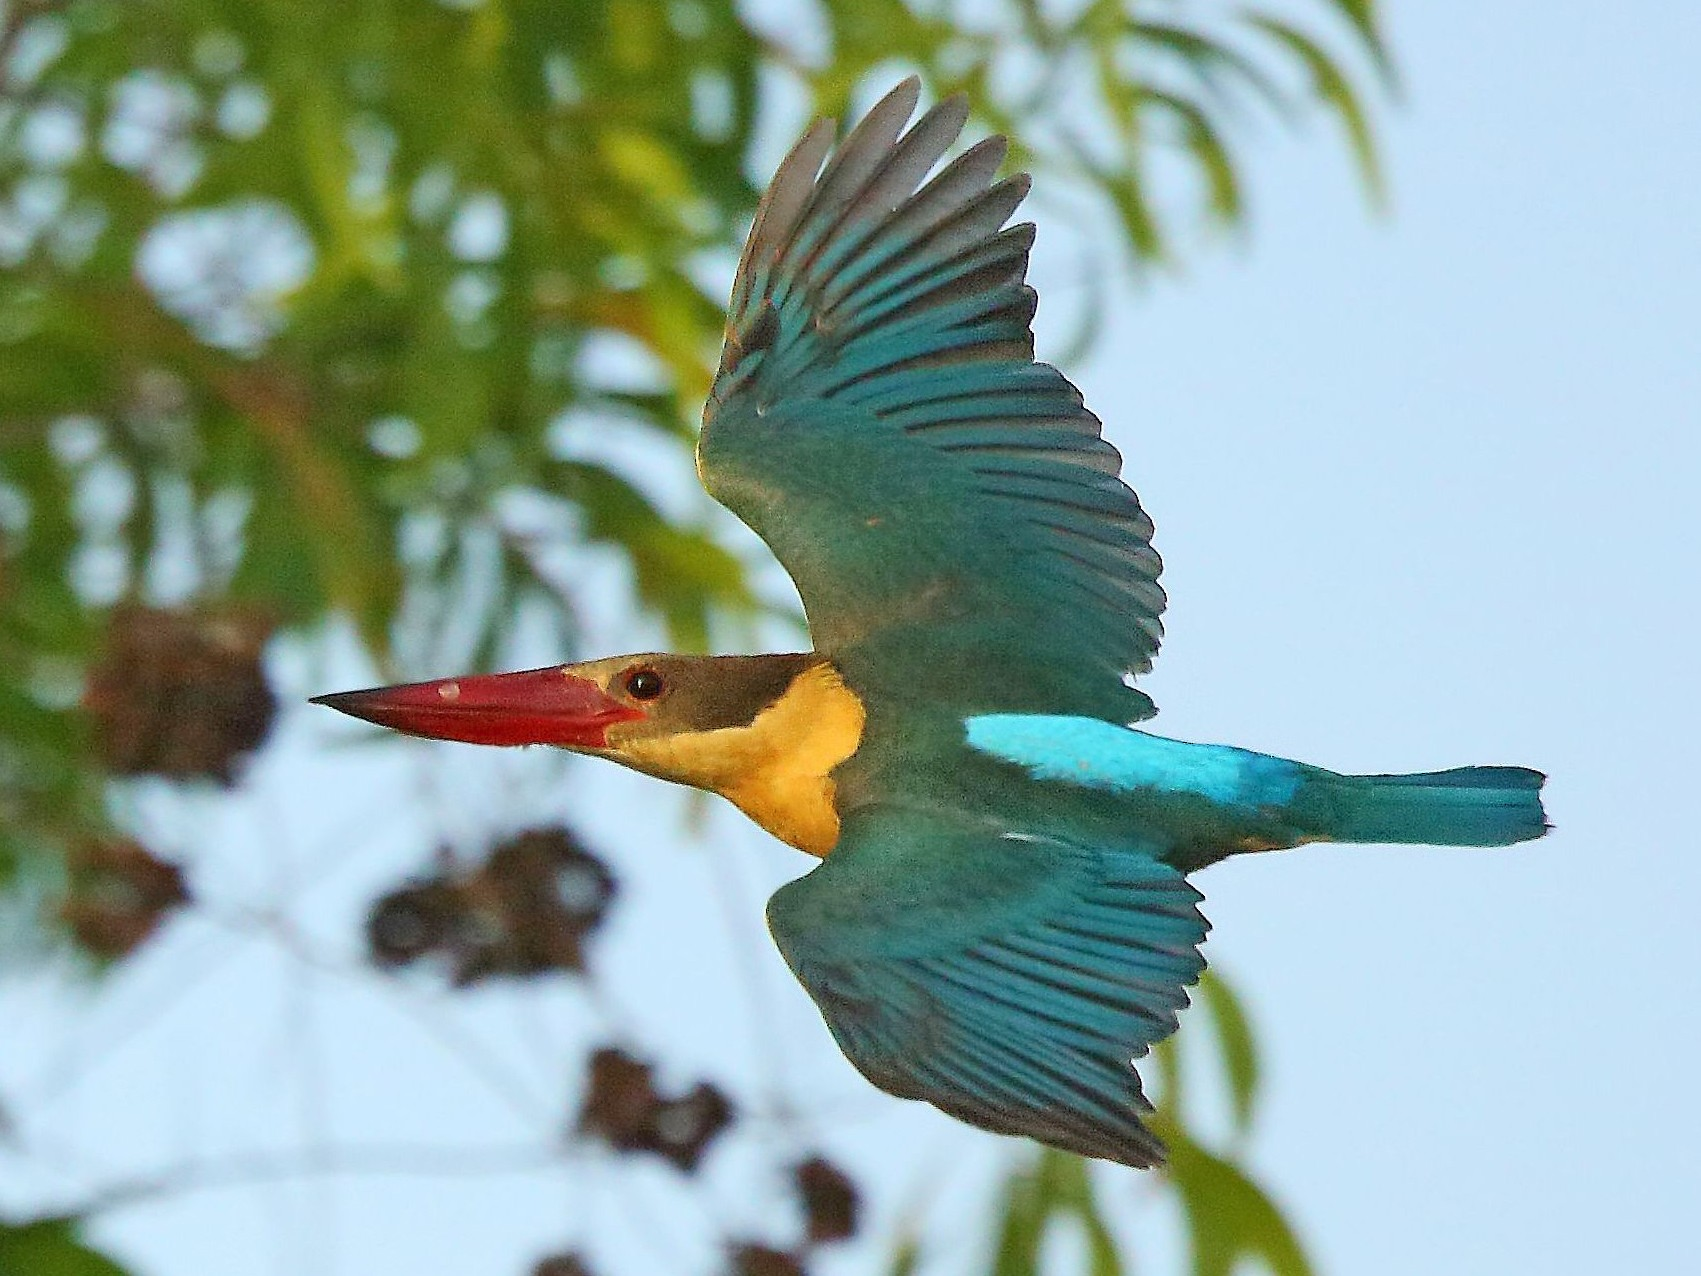 Stork-billed Kingfisher - Albin Jacob